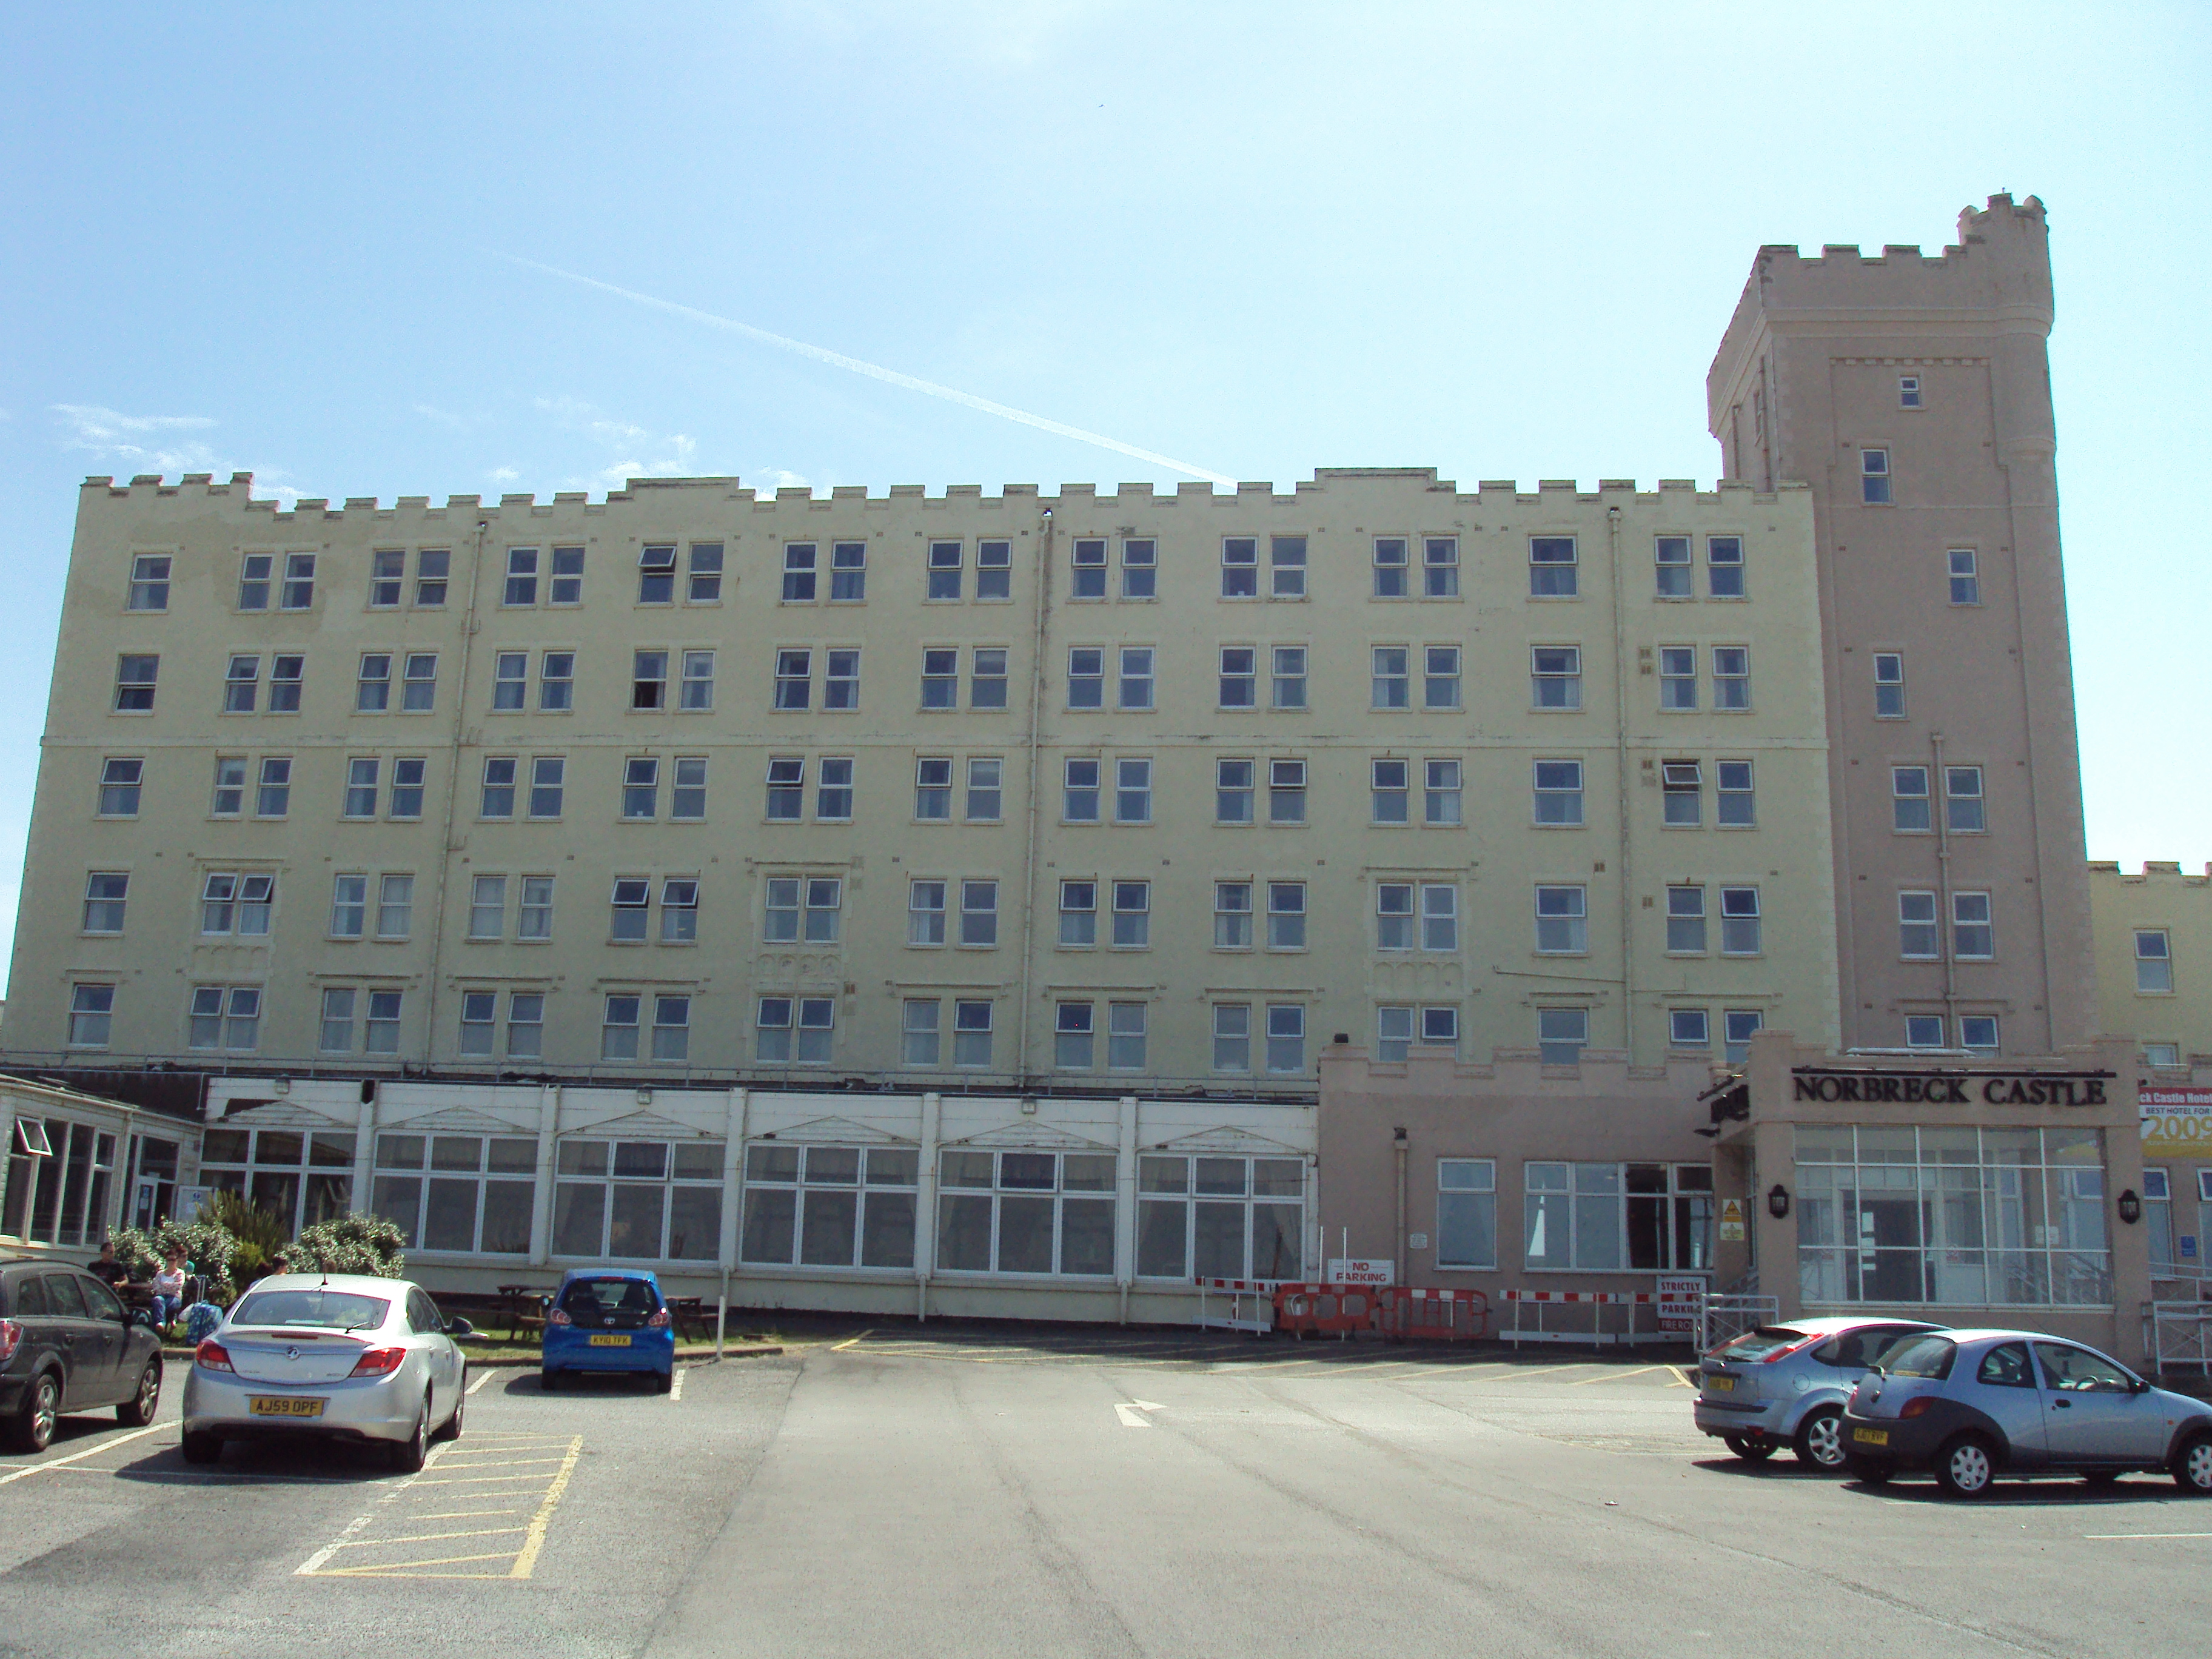 Norbreck Castle Hotel Blackpool Phone Number